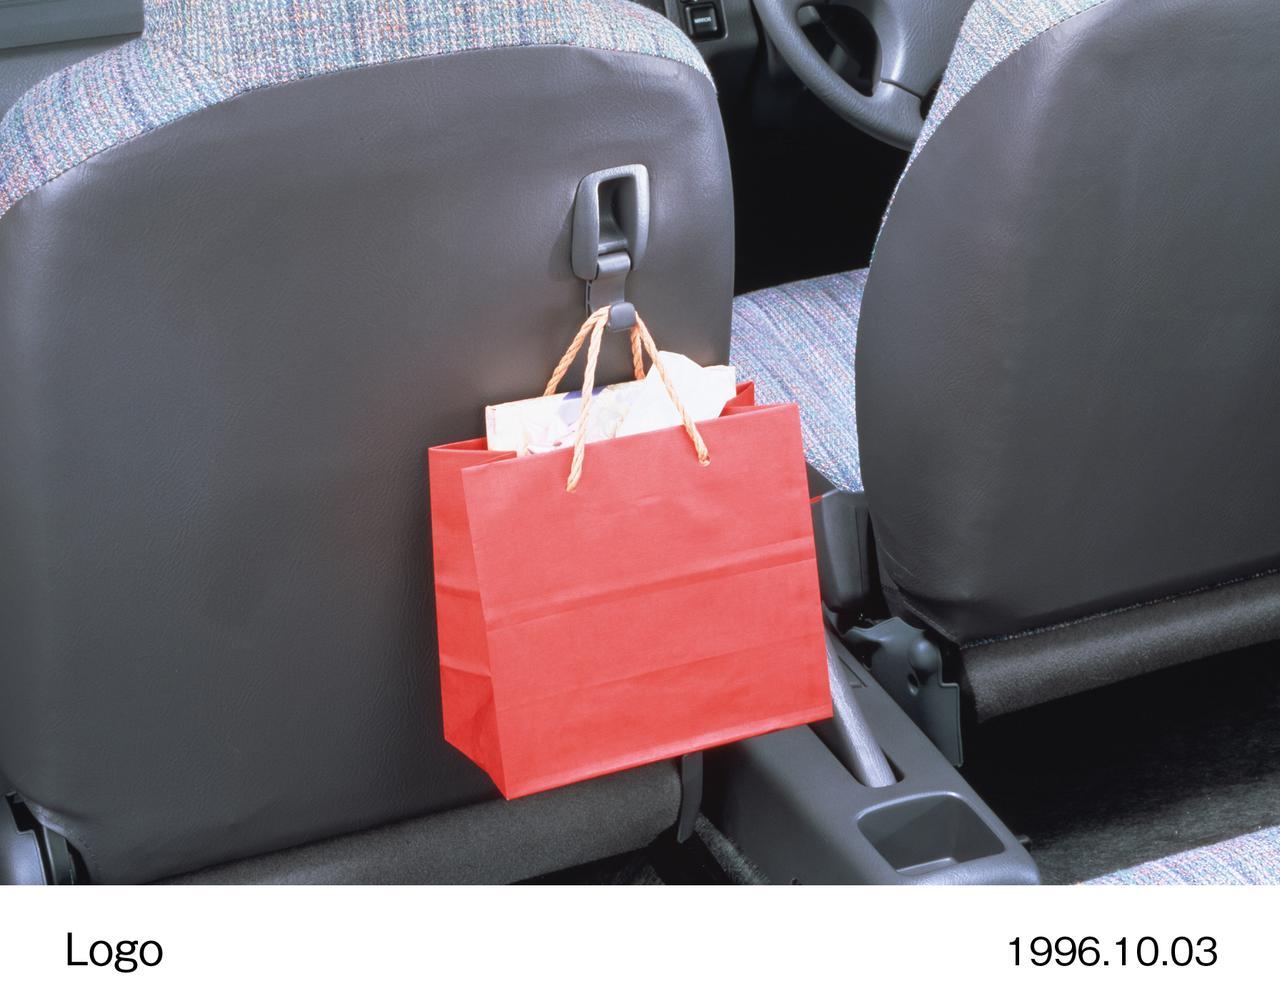 Images : 4番目の画像 - ホンダロゴ関連の画像はこちら(クリックして拡大) - A Little Honda | ア・リトル・ホンダ(リトホン)